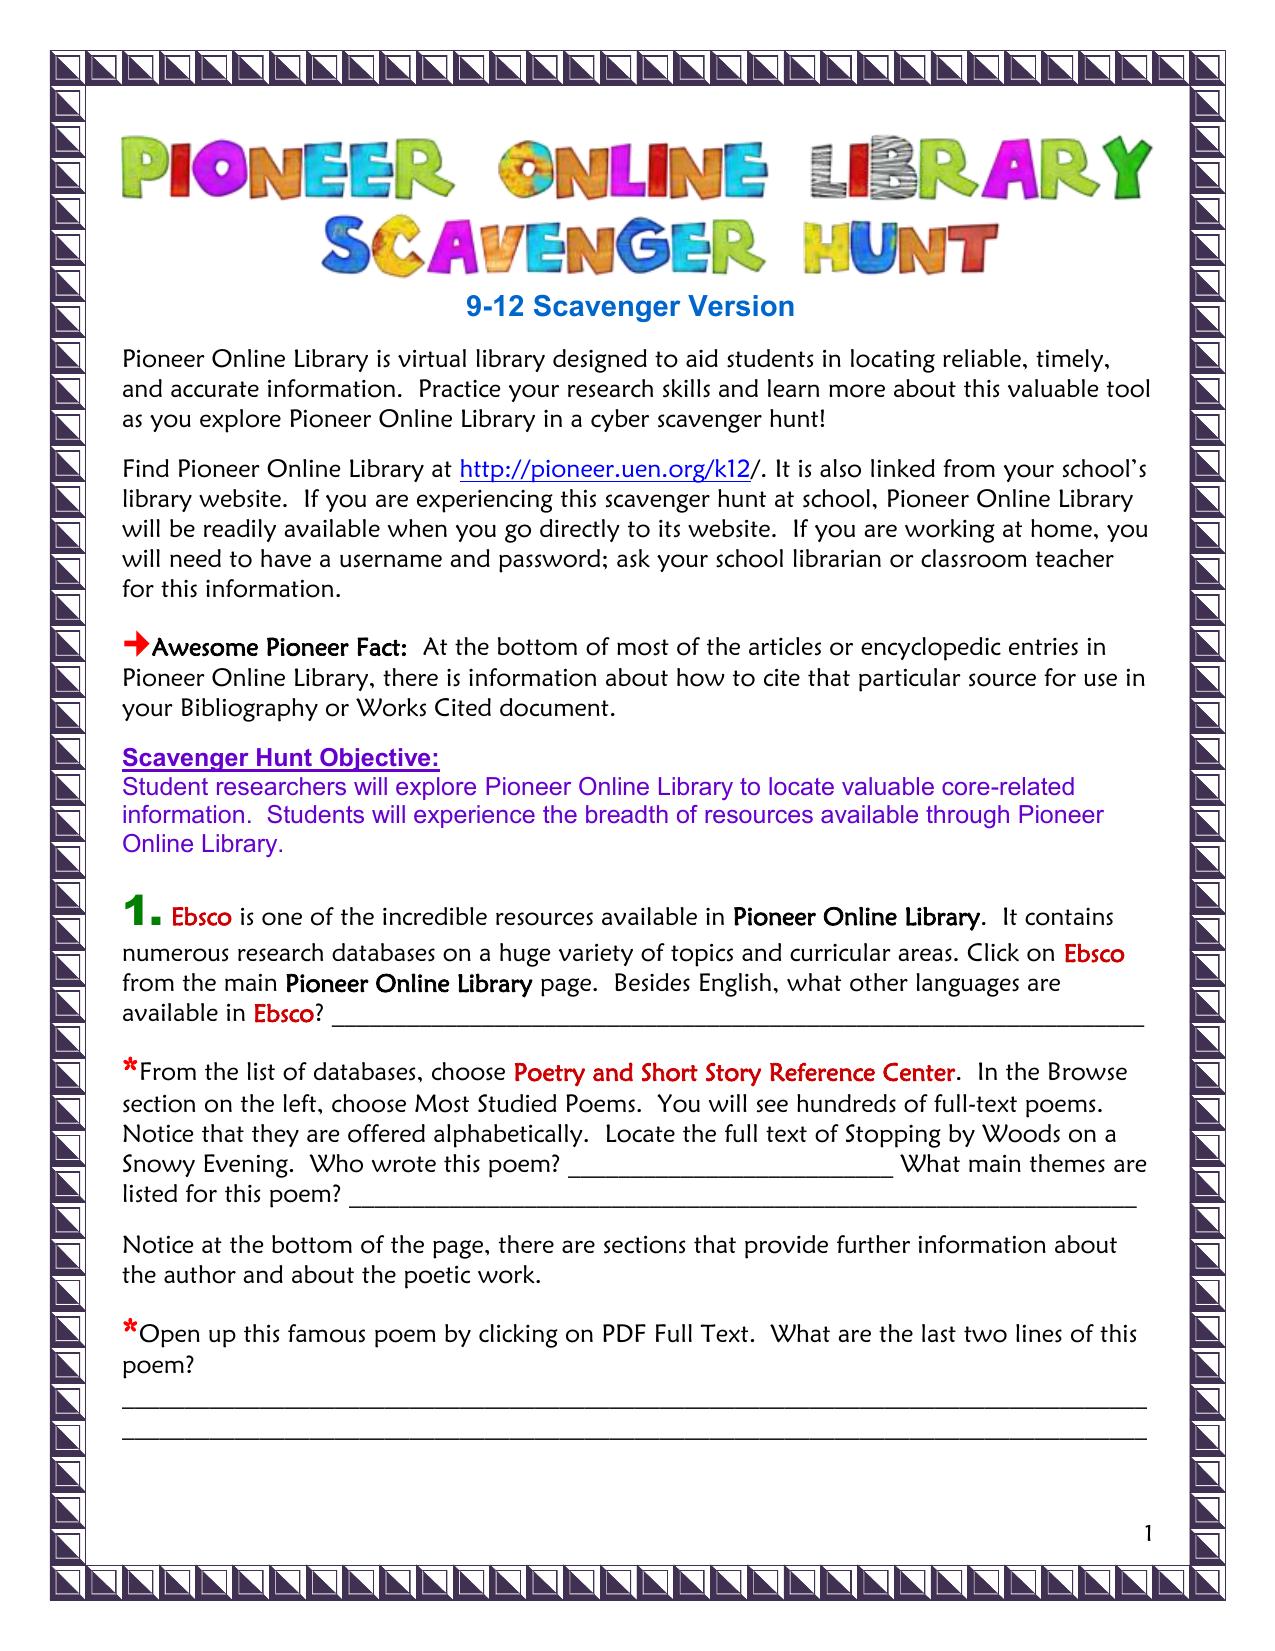 Scavenger Hunt - Pioneer Library